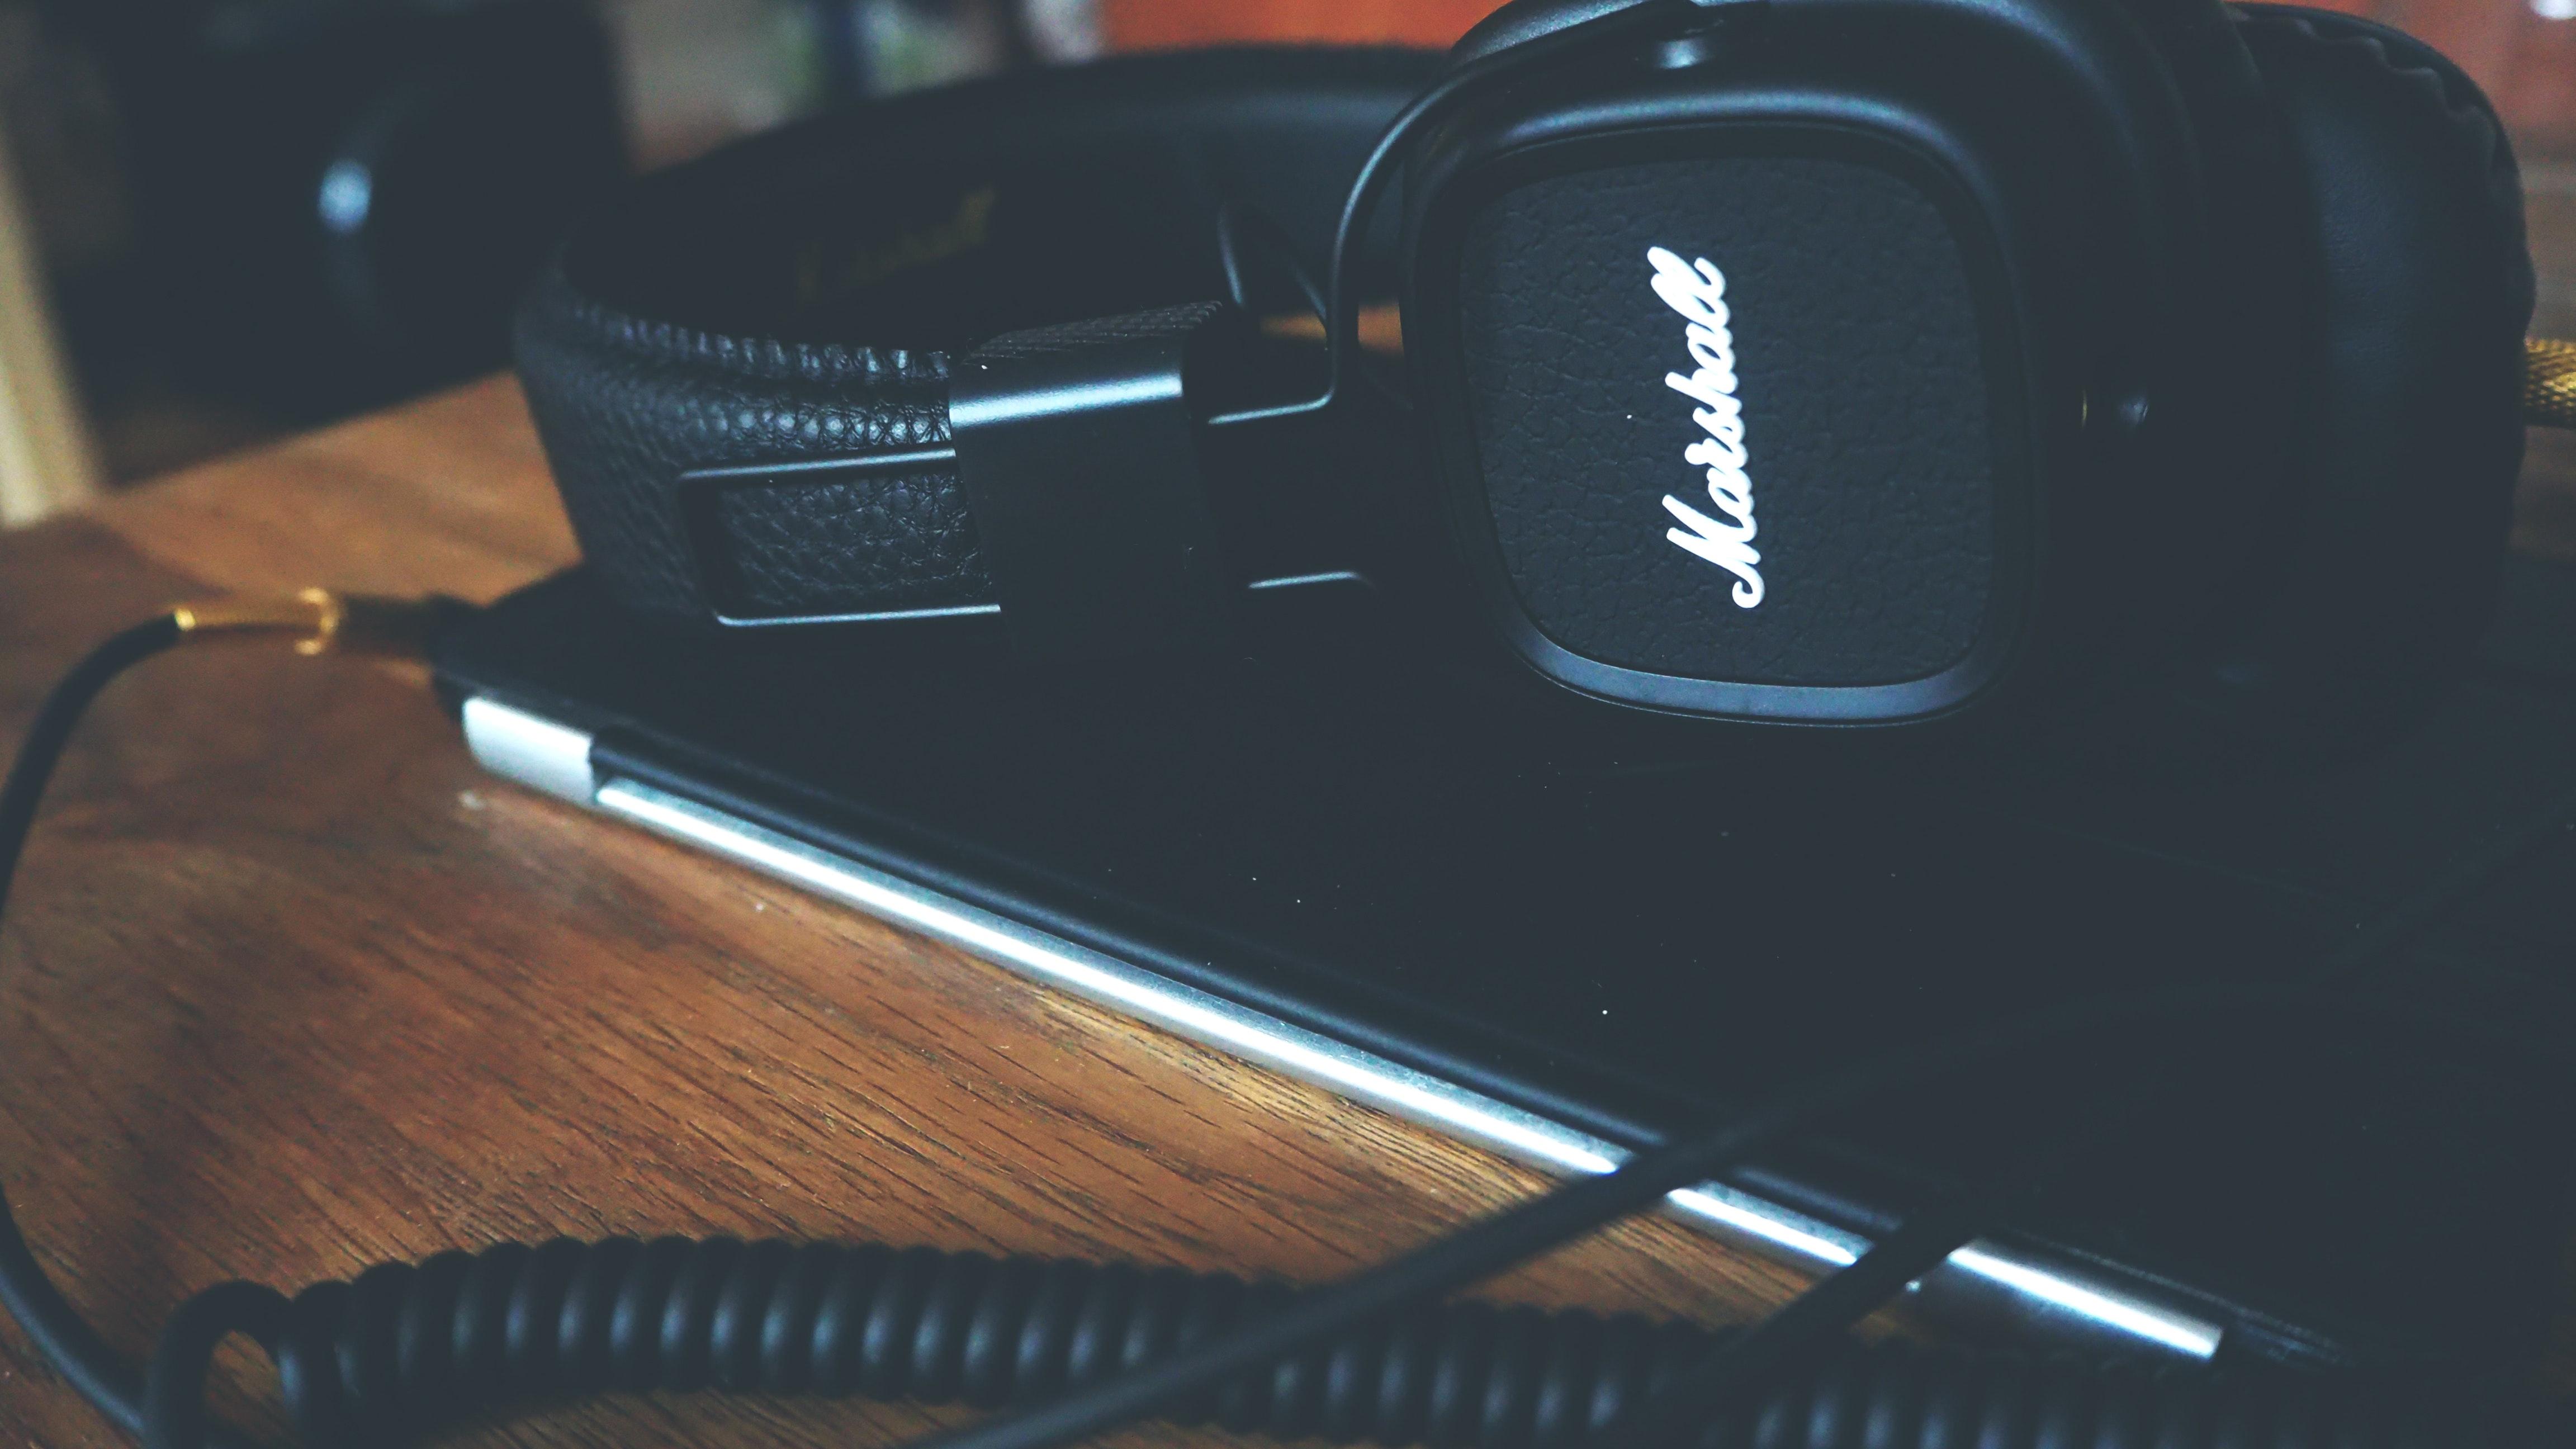 Close-up of headphone photo